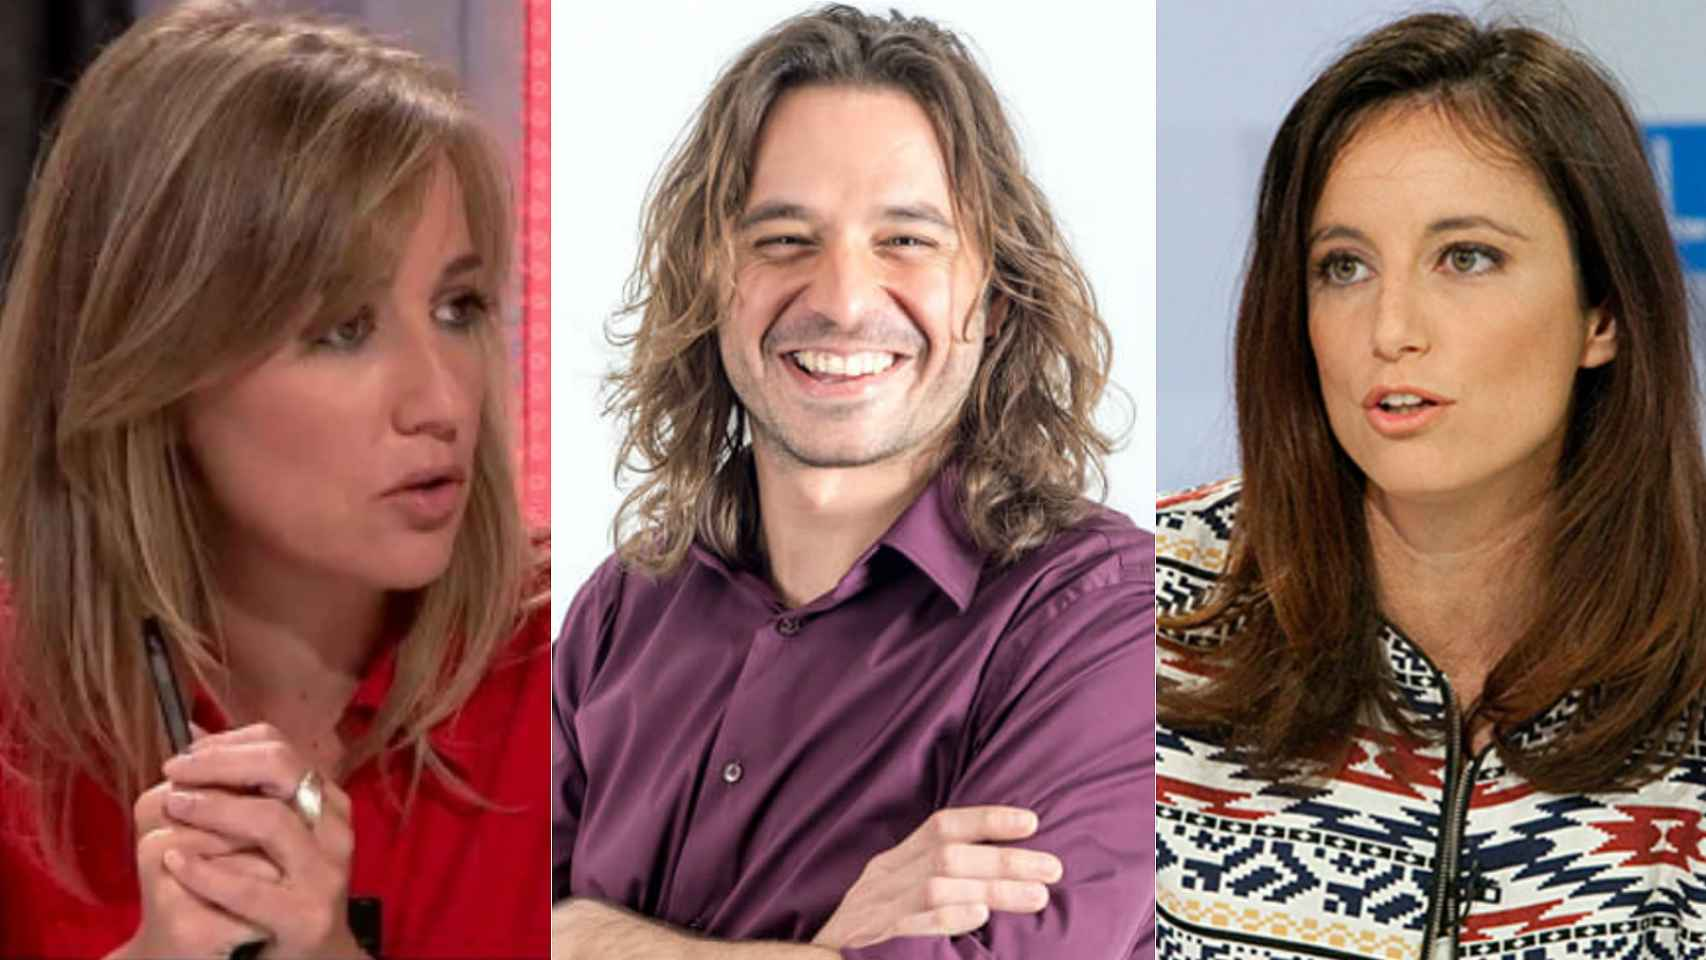 Tania, Levy, Vila: un triángulo amoroso virtual